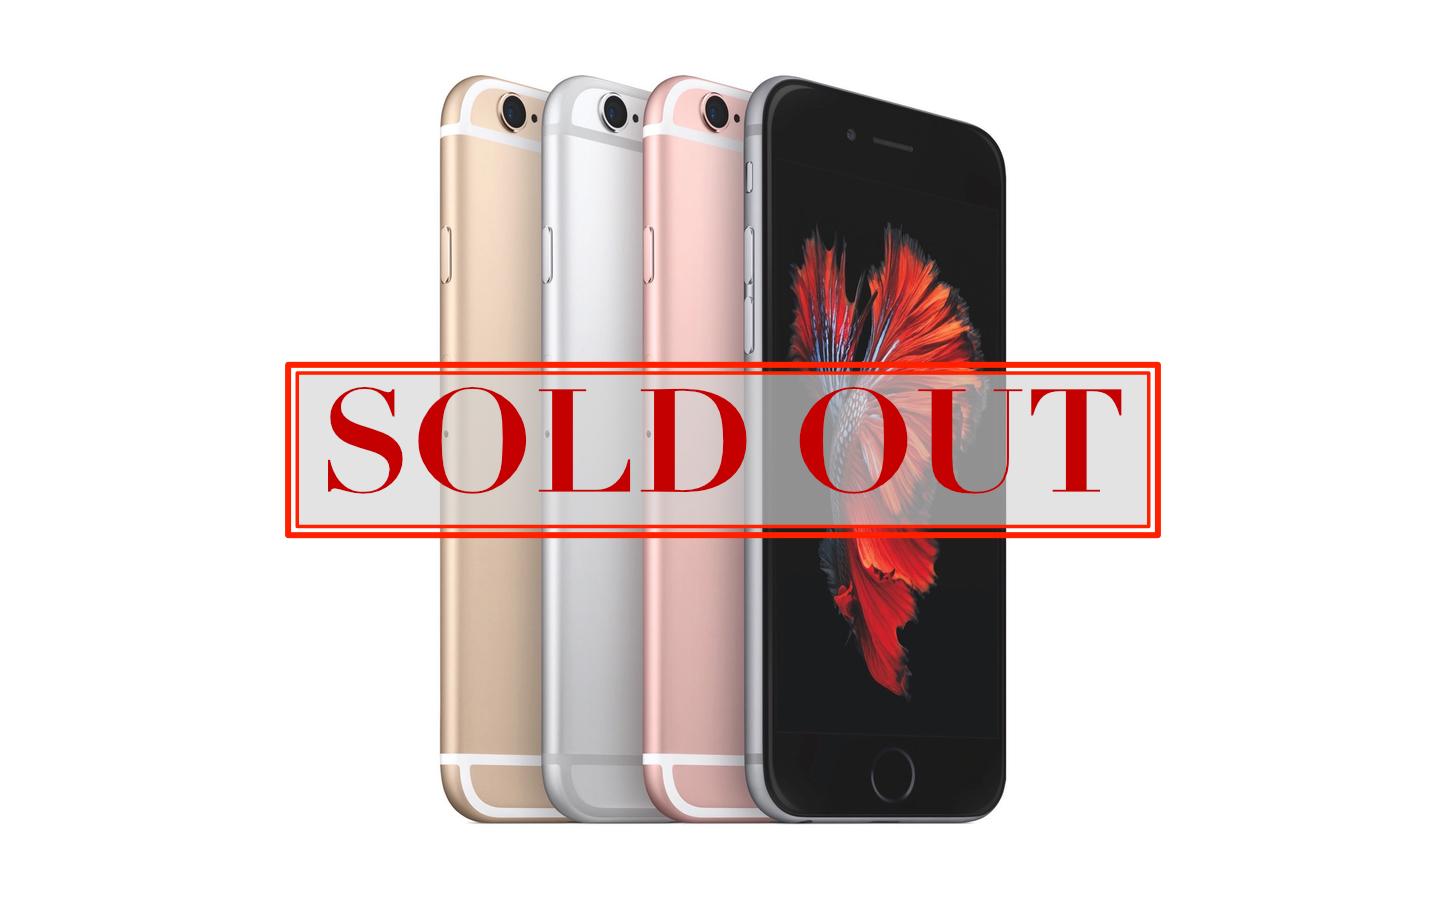 Iphone6s 6splus soldout